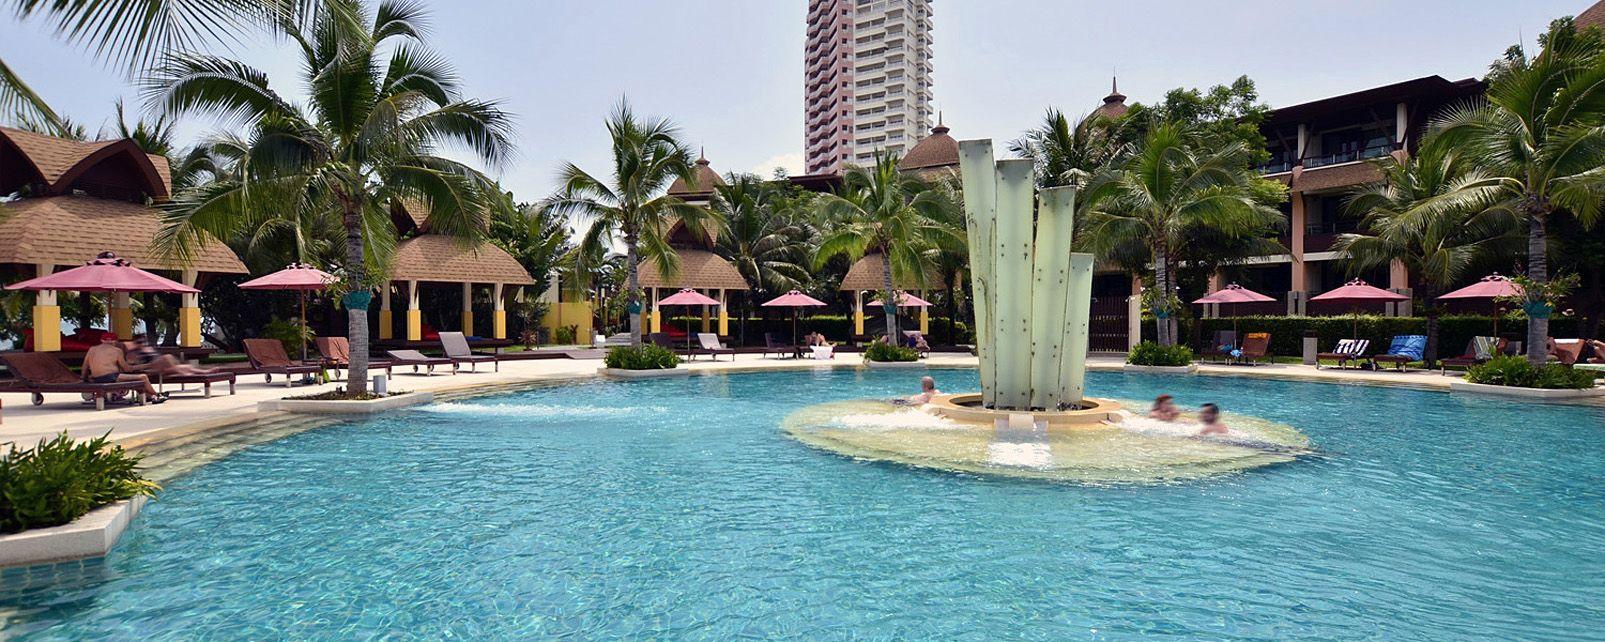 Hôtel Springfield @ Sea Resort and Spa